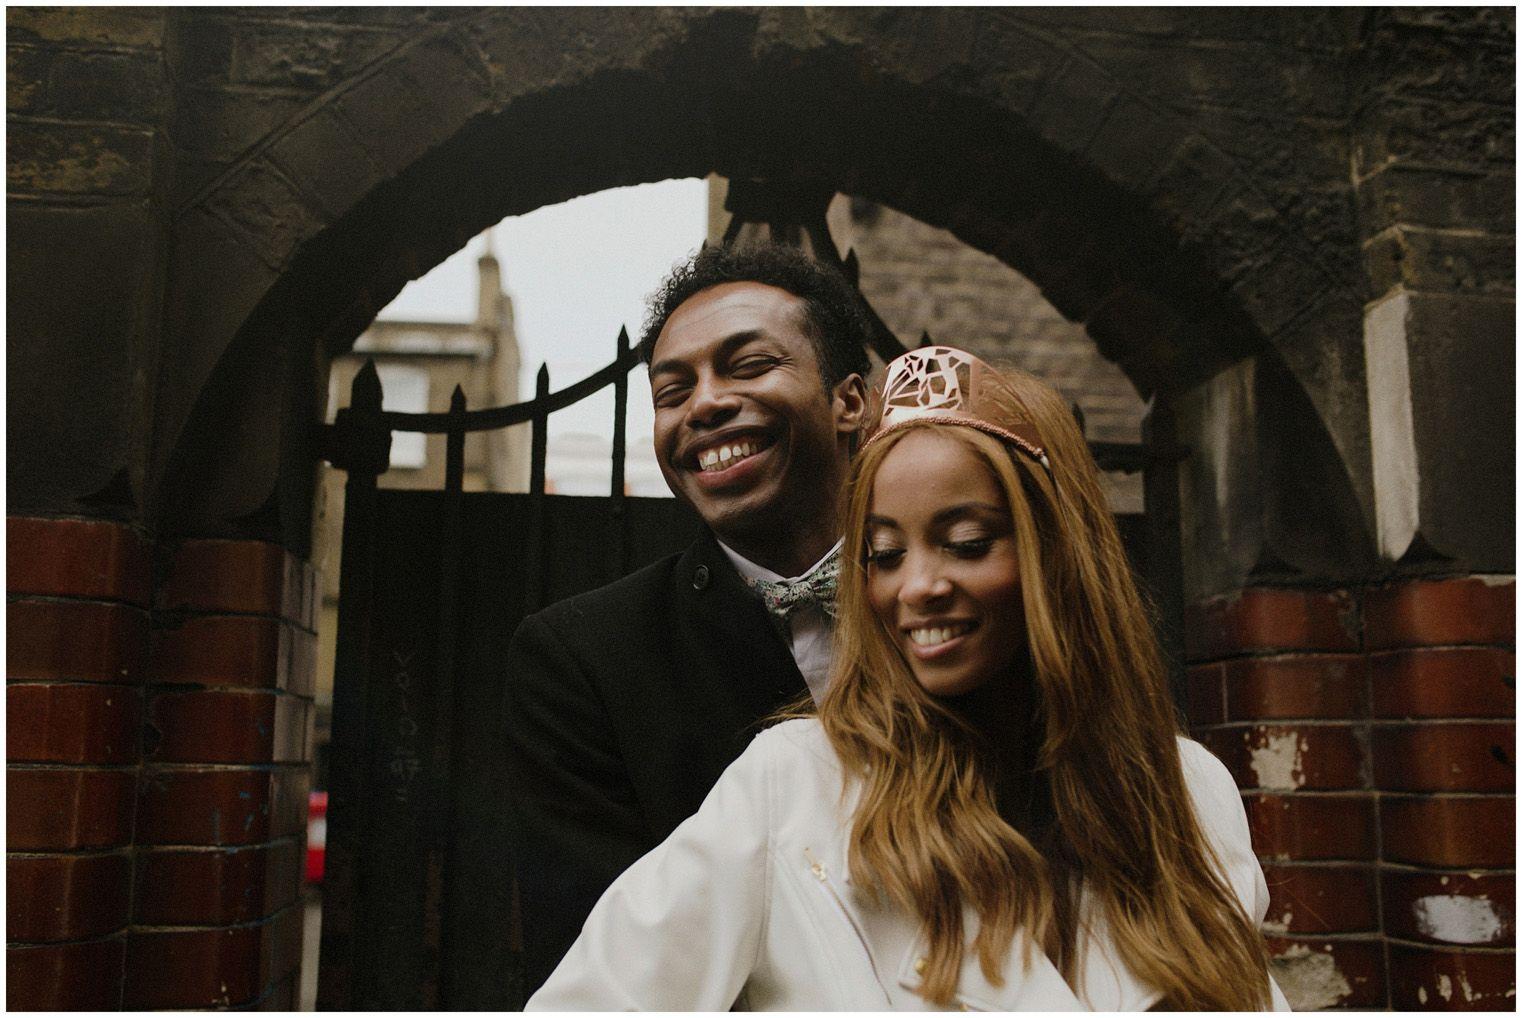 LONDON WEDDING PHOTOGRAPHY #wedding #londonwedding #shoreditchwedding #urbanwedding #weddinginspiration #inspiration #bridal #groom #novia #novio #bodaoriginal #original #modern #photography #photographer #videography #wedding videography #filmmaker #deco #decoration #natural #london #barcelona #madrid #spain #europe #usa #idea #uk #different #destination